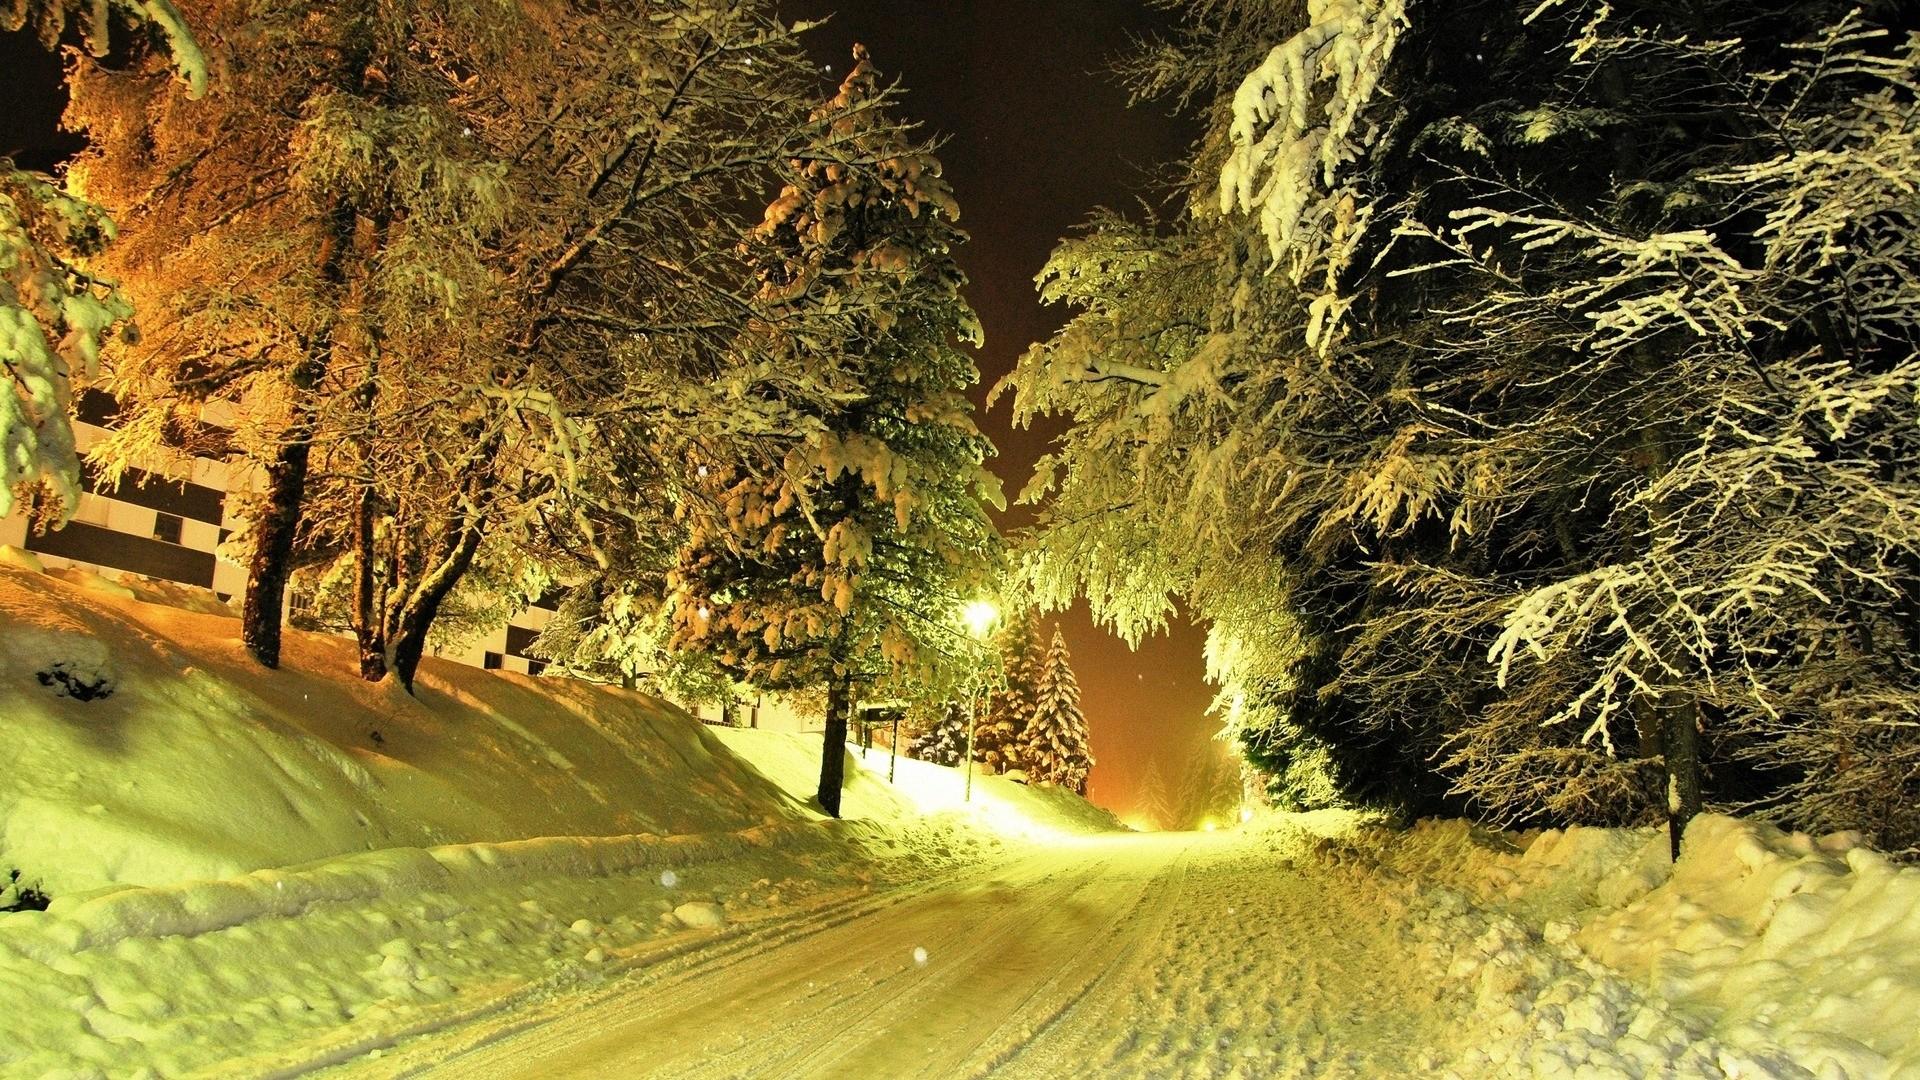 Winter Nights HD Wallpaper